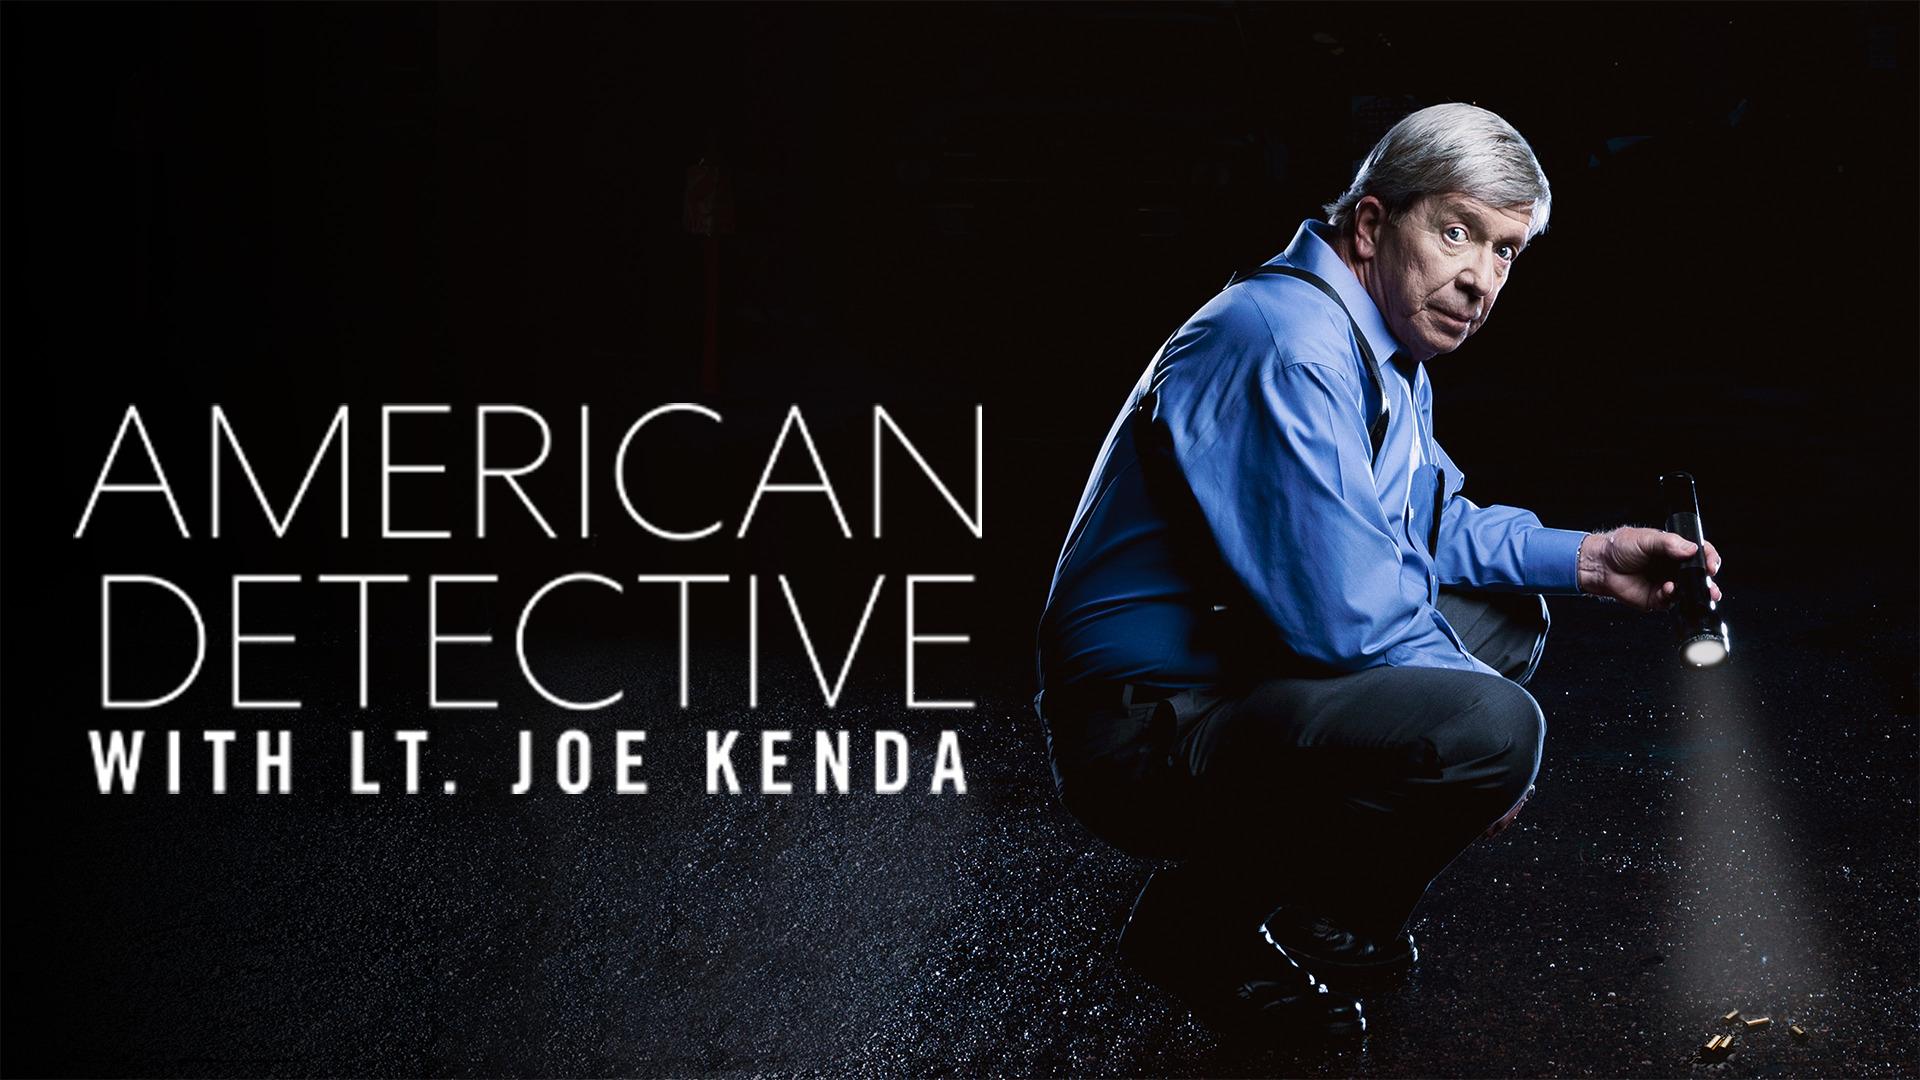 American Detective With Lt. Joe Kenda - Season 1